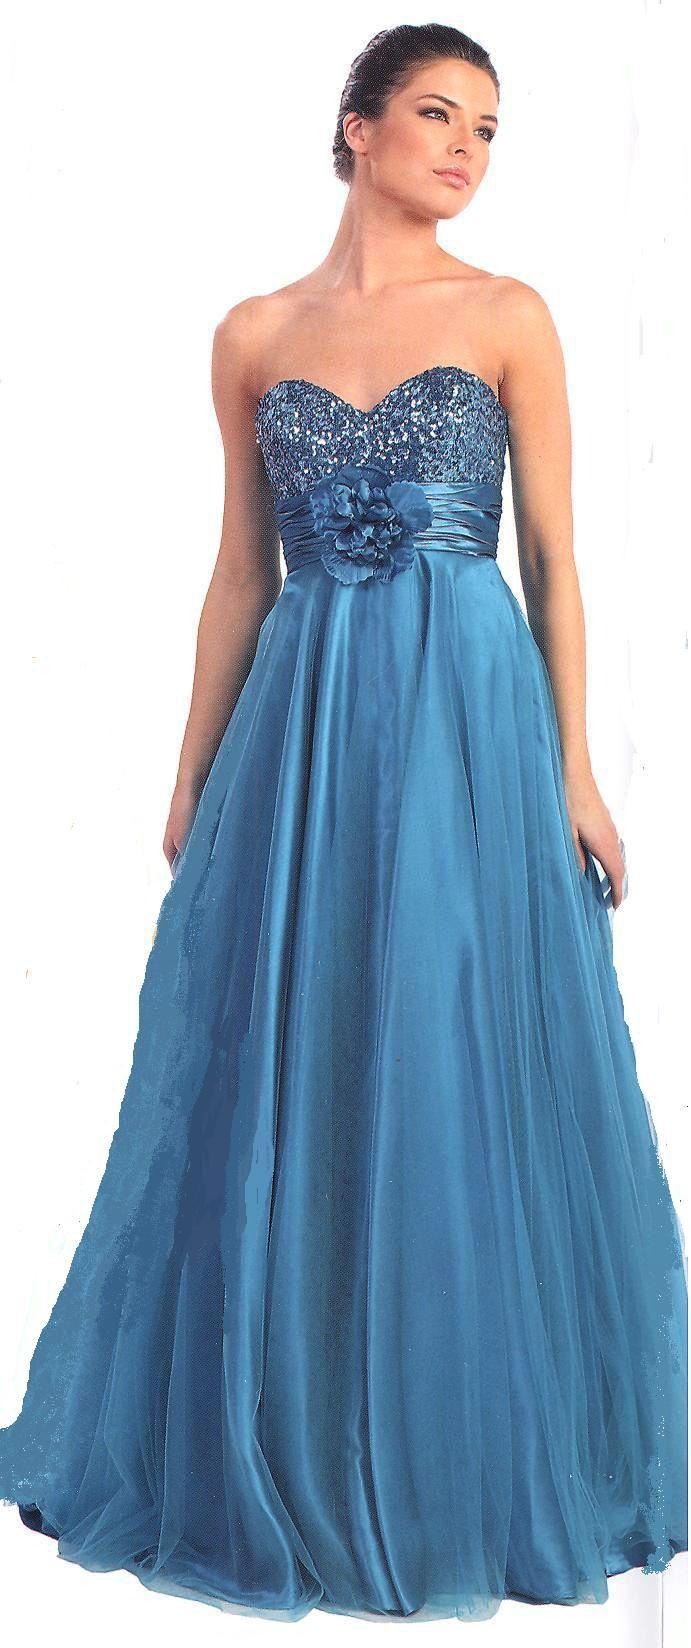 Prom dressball dress under light up the night new